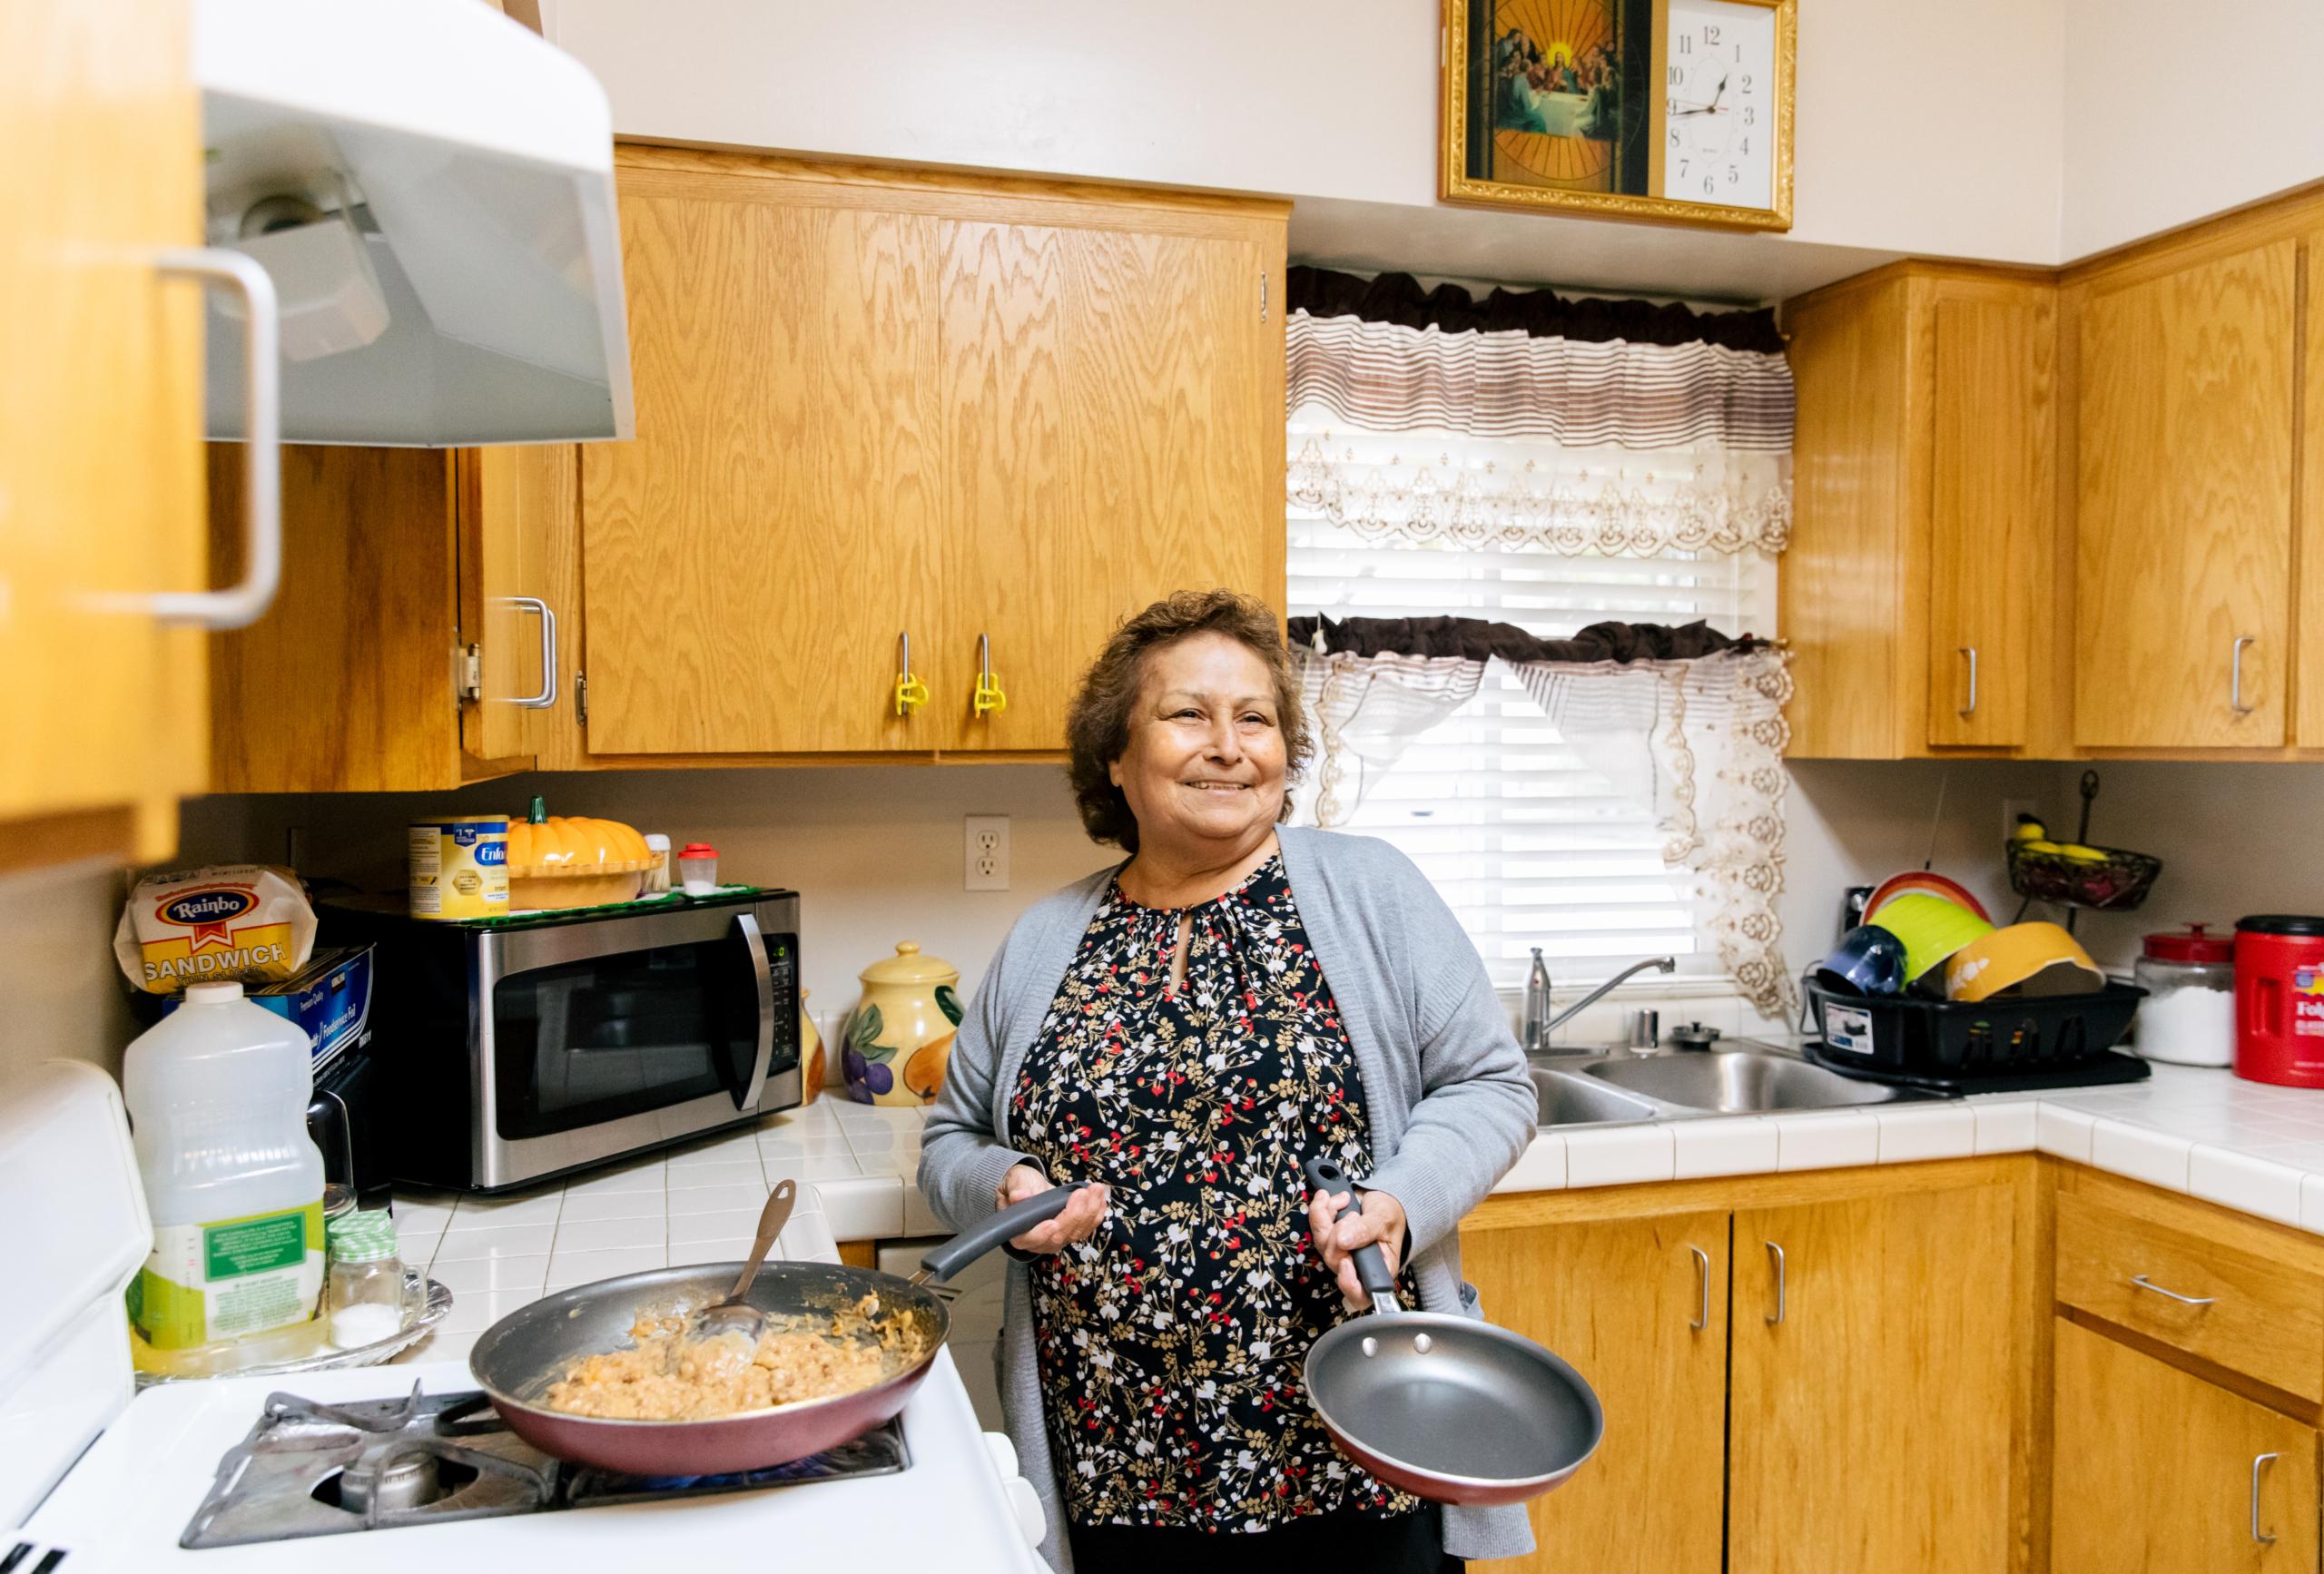 Maria Chavira cooks tortillas, eggs, and beans inside her home